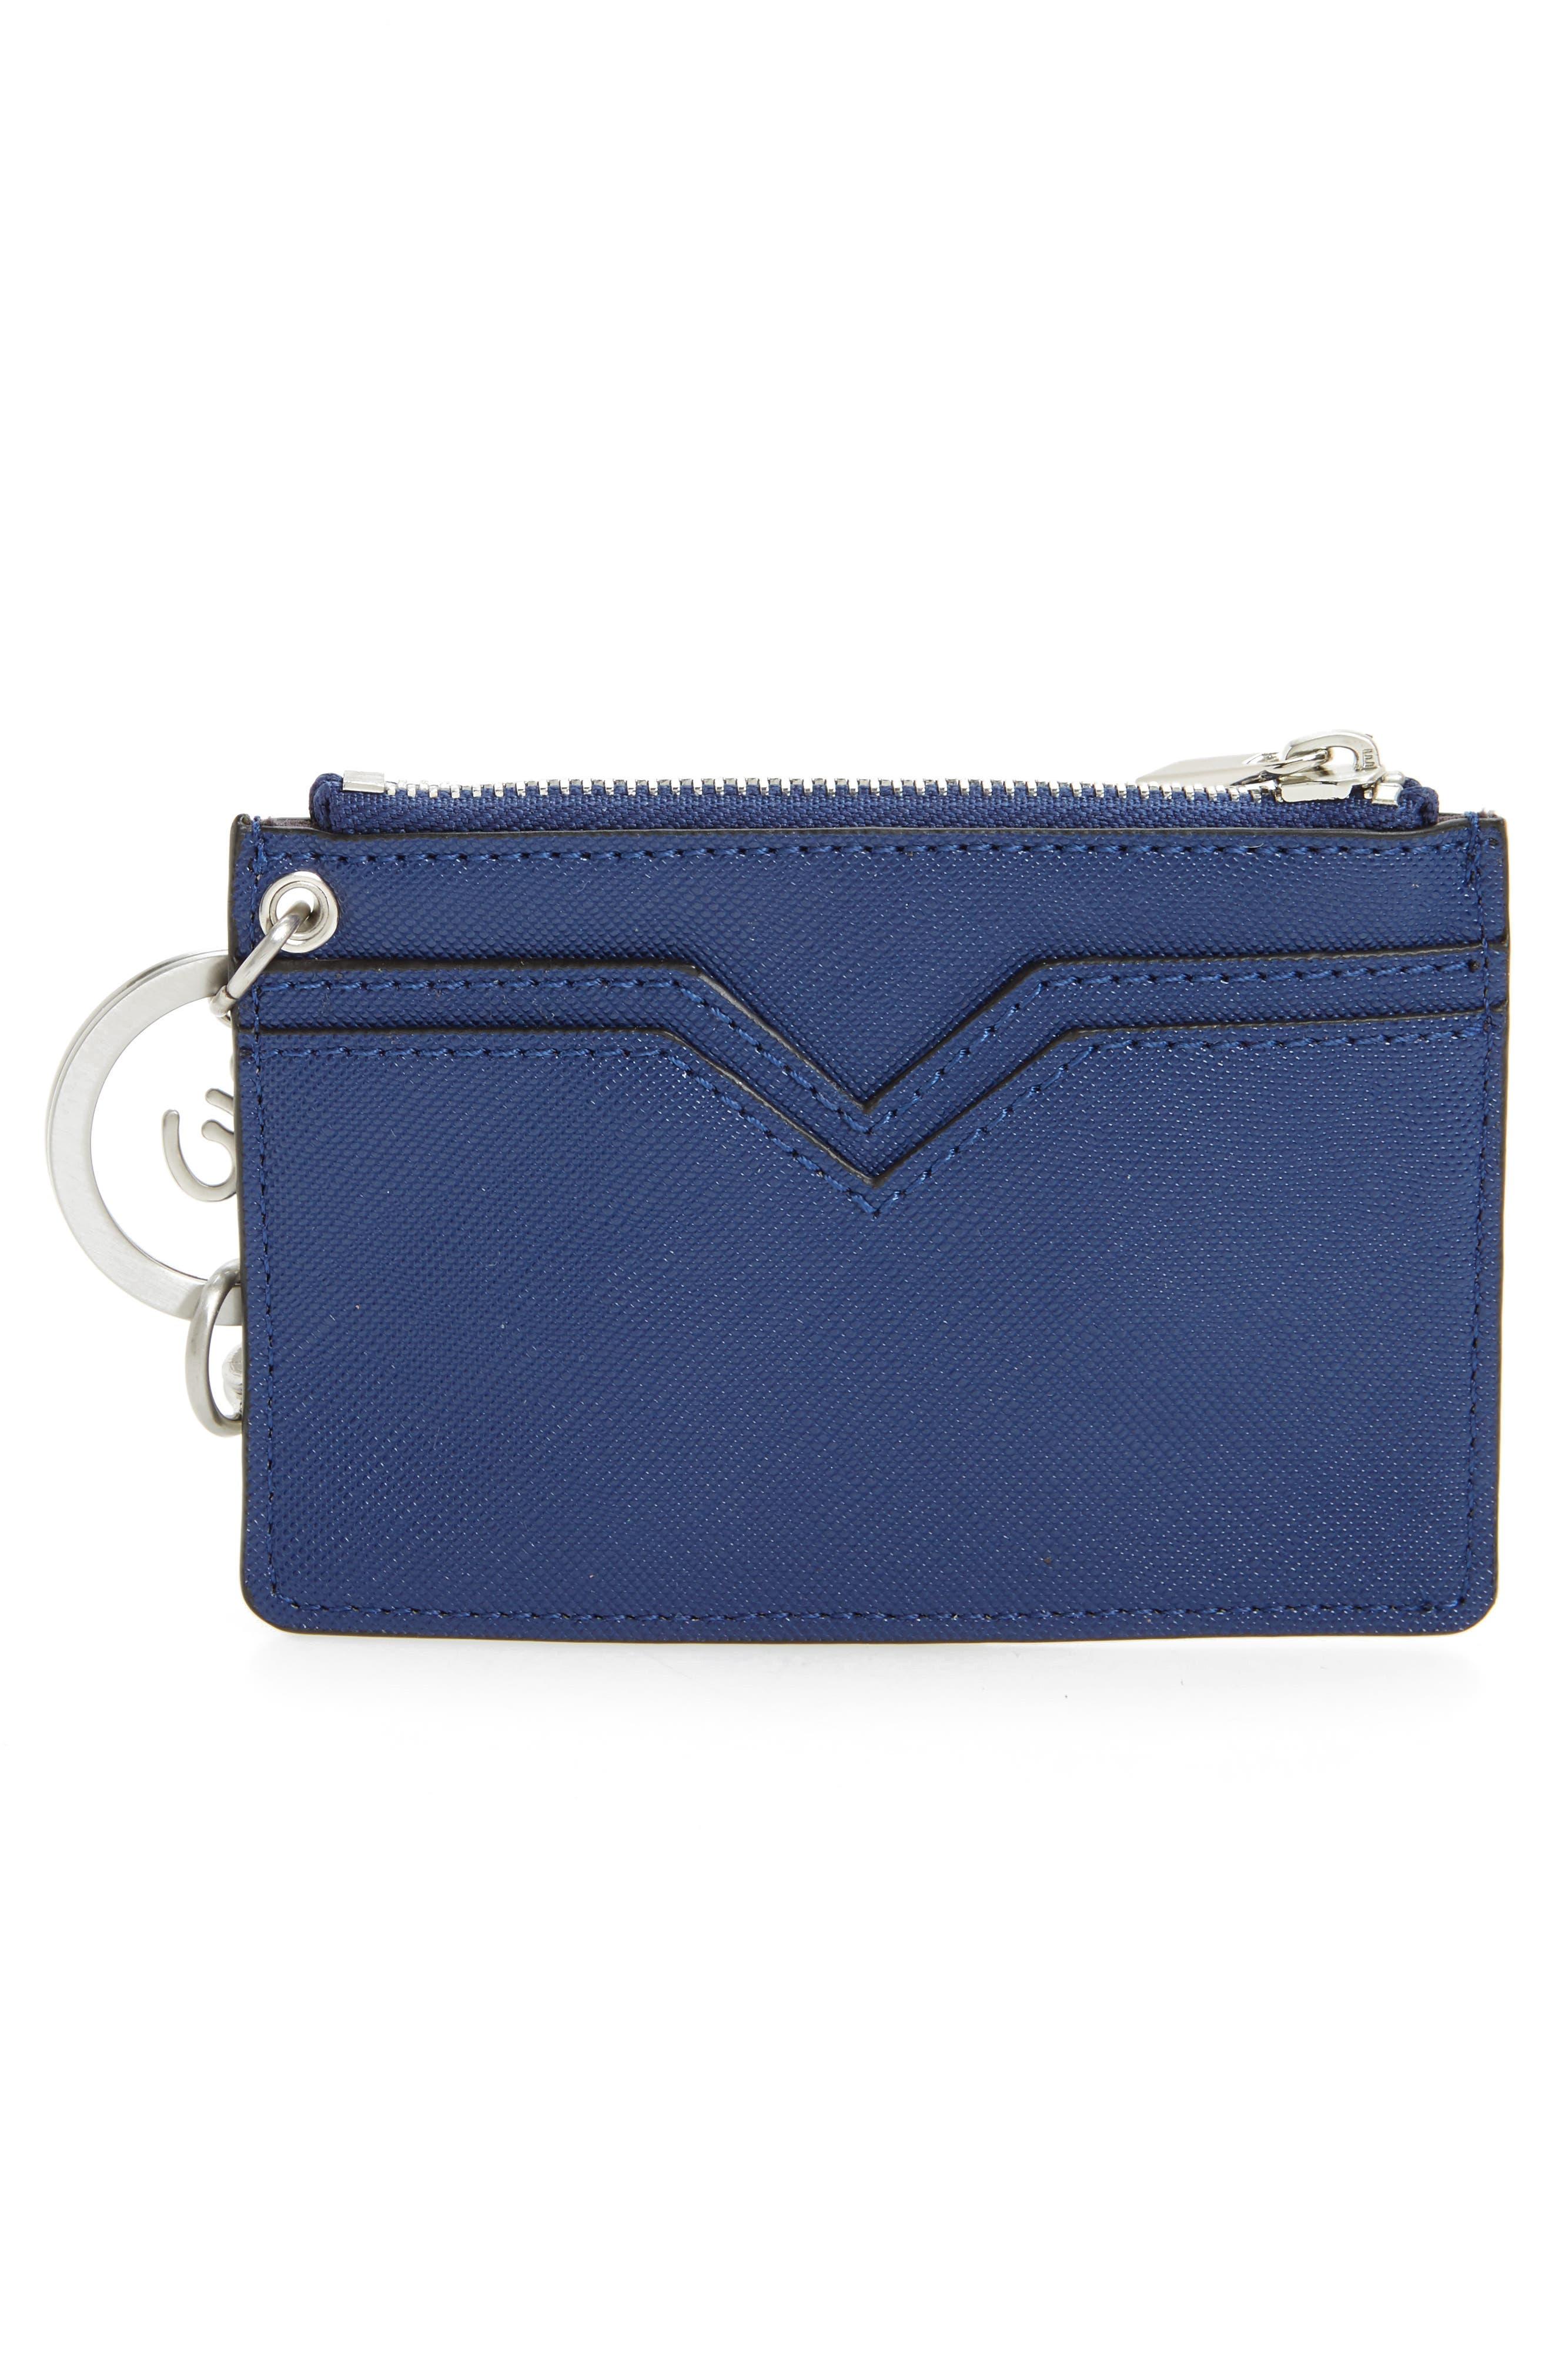 Carter Bird Embellished Faux Leather Card Case,                             Alternate thumbnail 2, color,                             Poseidon Blue